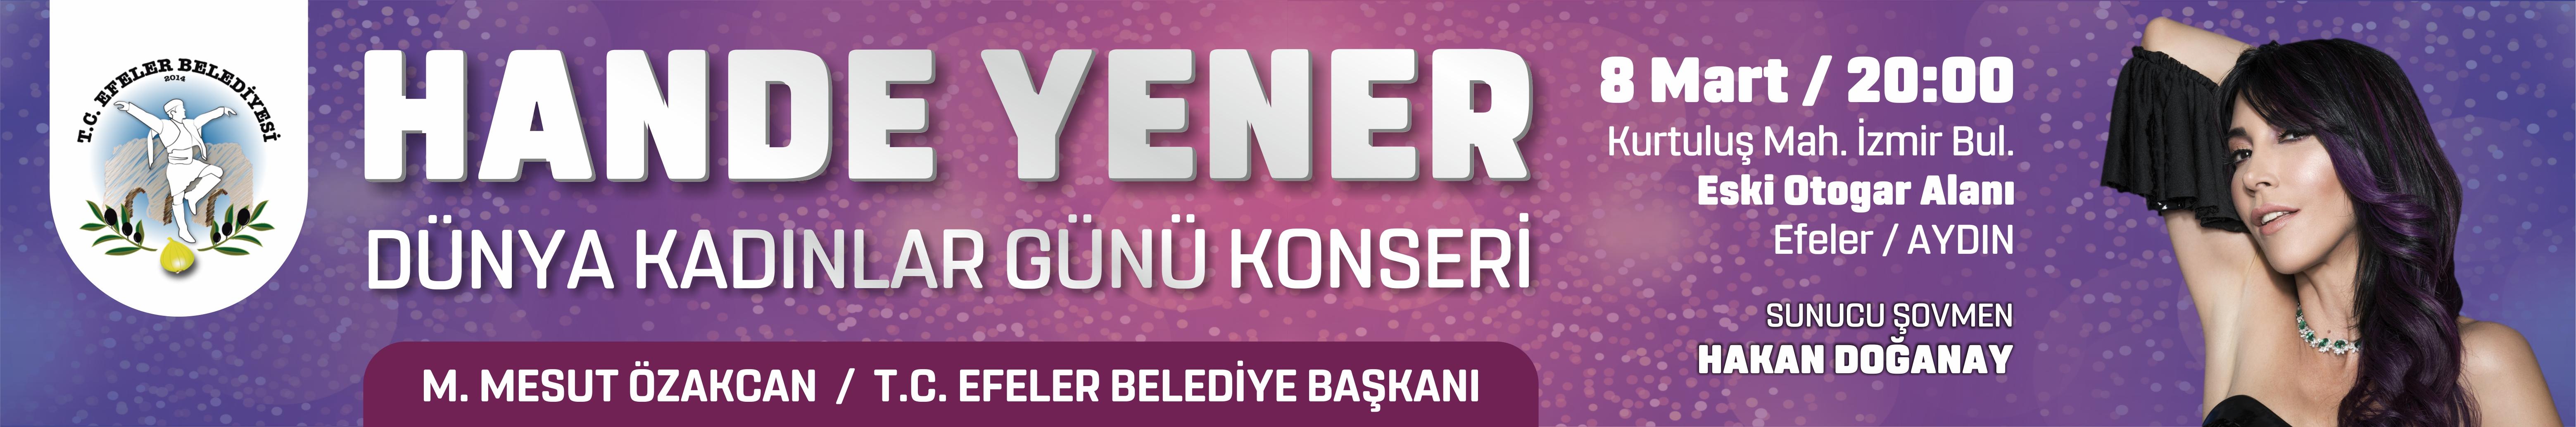 HANDE YENER KONSERİ